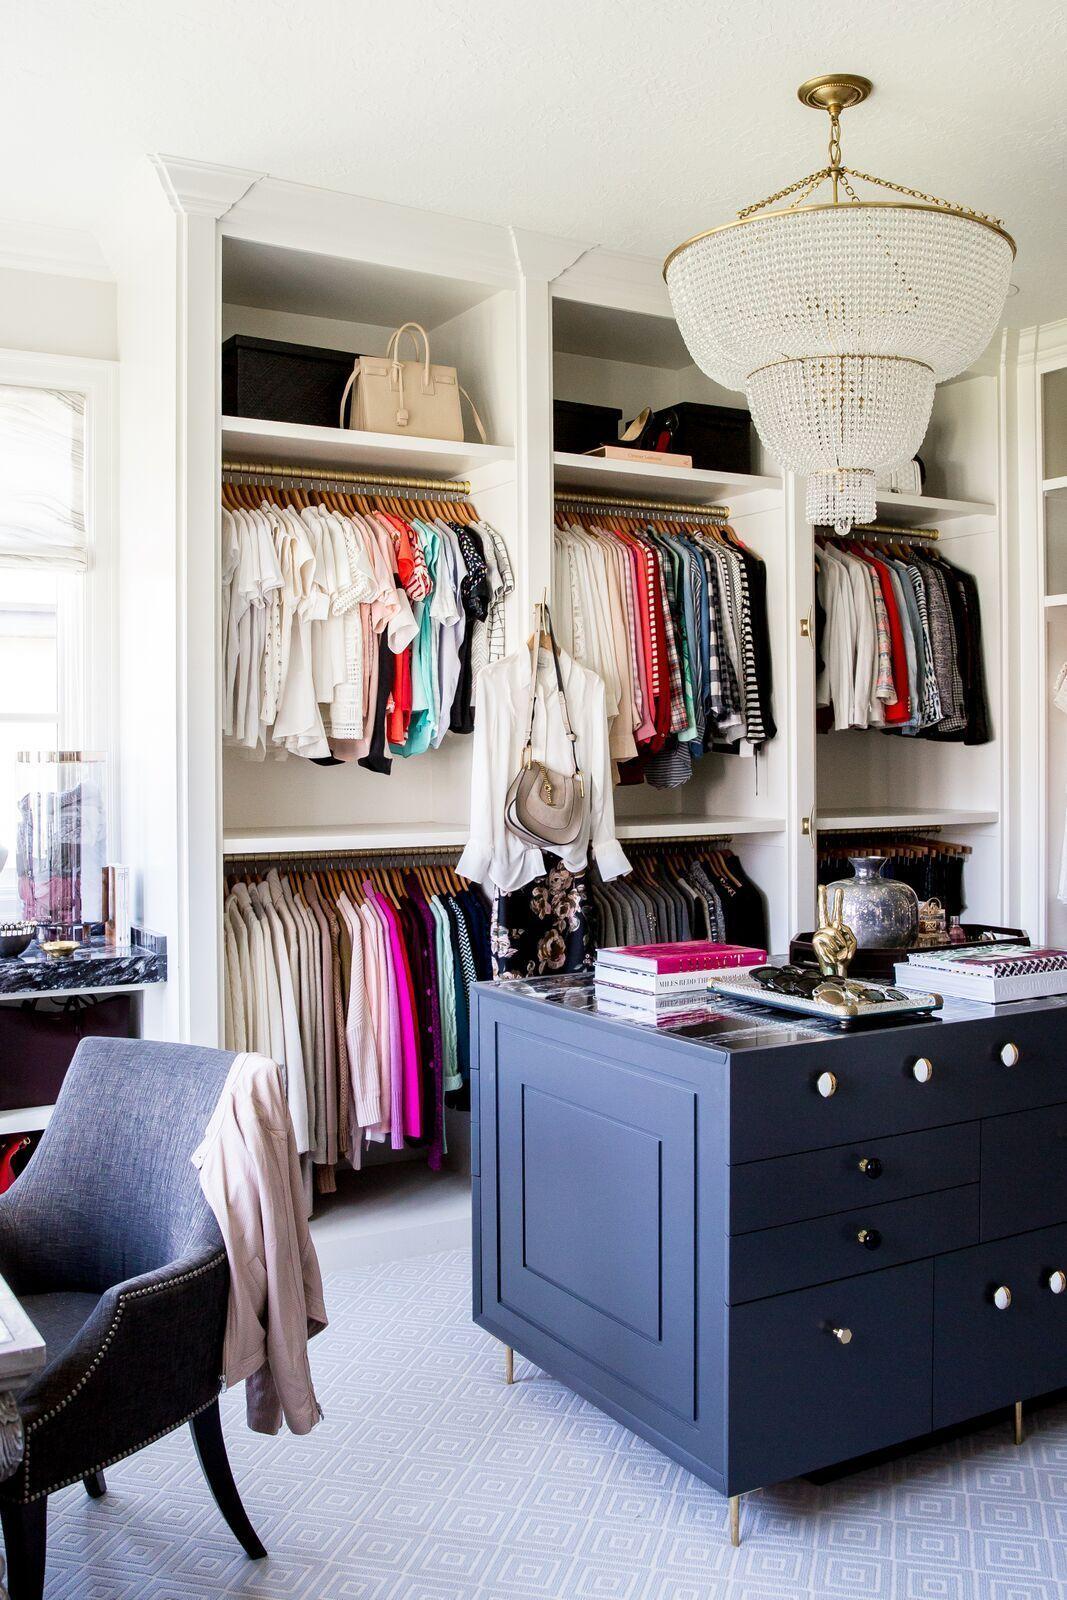 Jacqueline Chandelier In 2020 Dream Closet Design Closet Designs Dream Closets